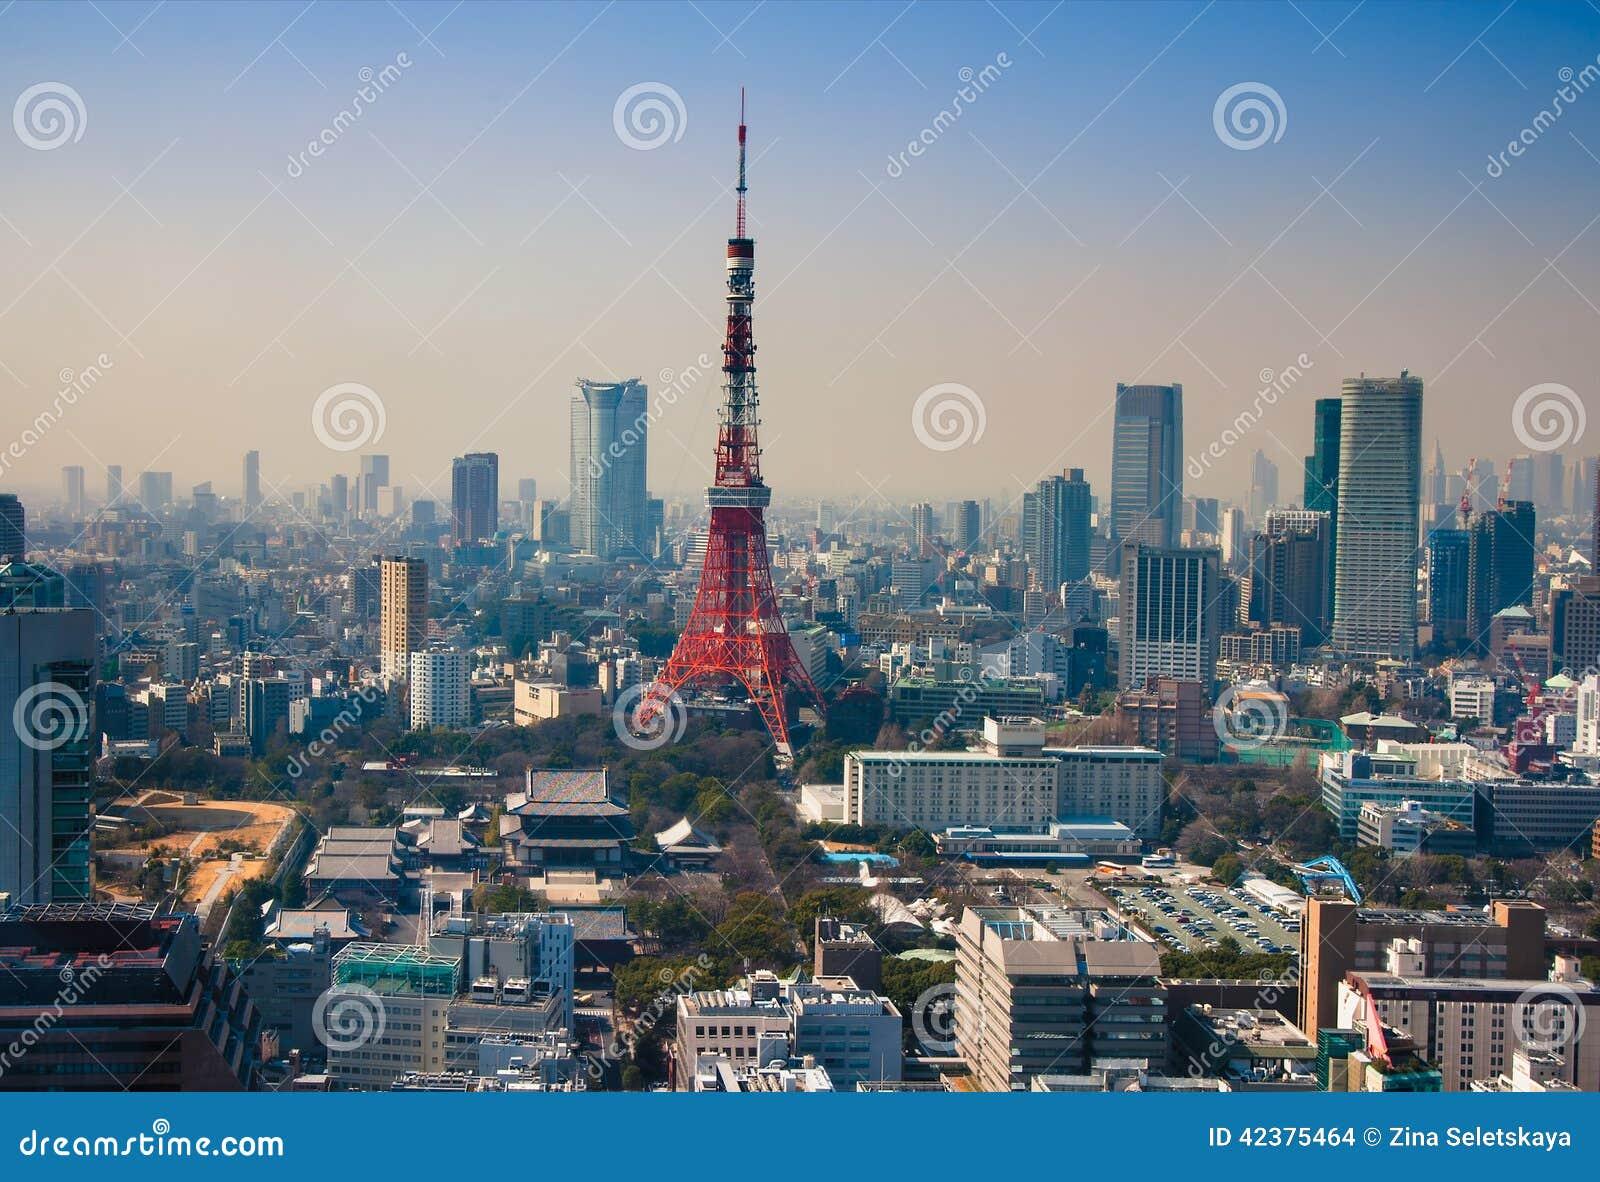 Tokyo Tower In Minato Ward Stock Photo - Image: 42375464